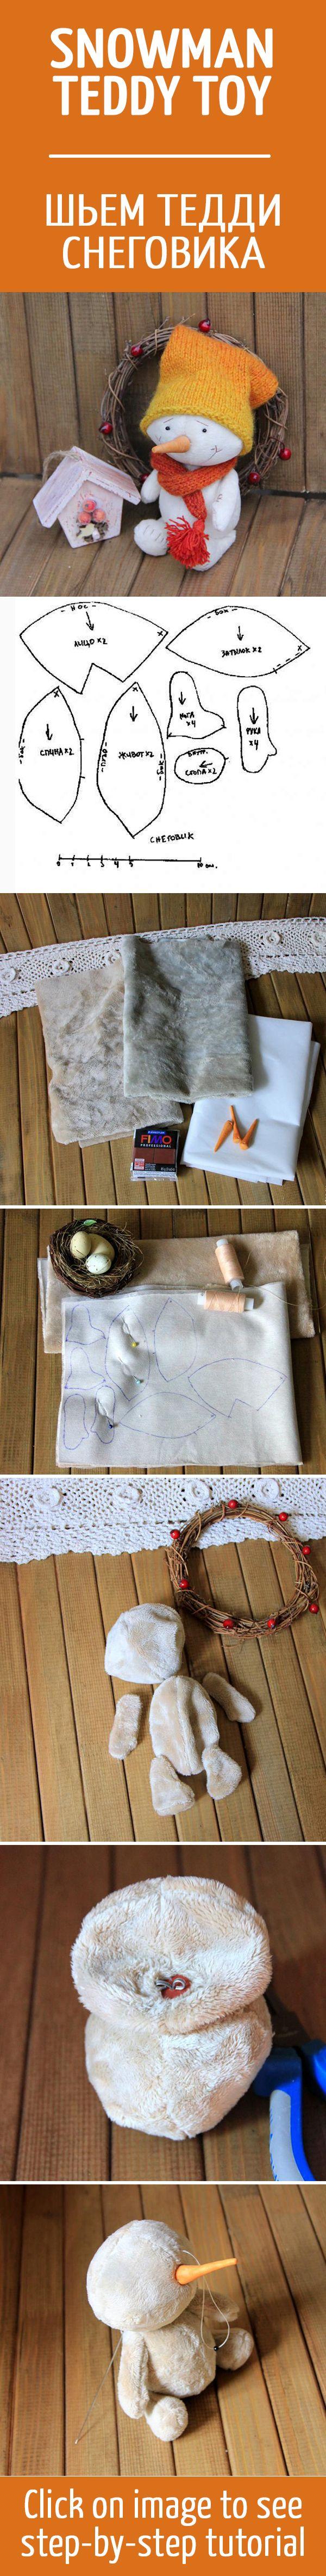 Шьем игрушку Тедди Снеговика / Snowman Teddy toy tutorial